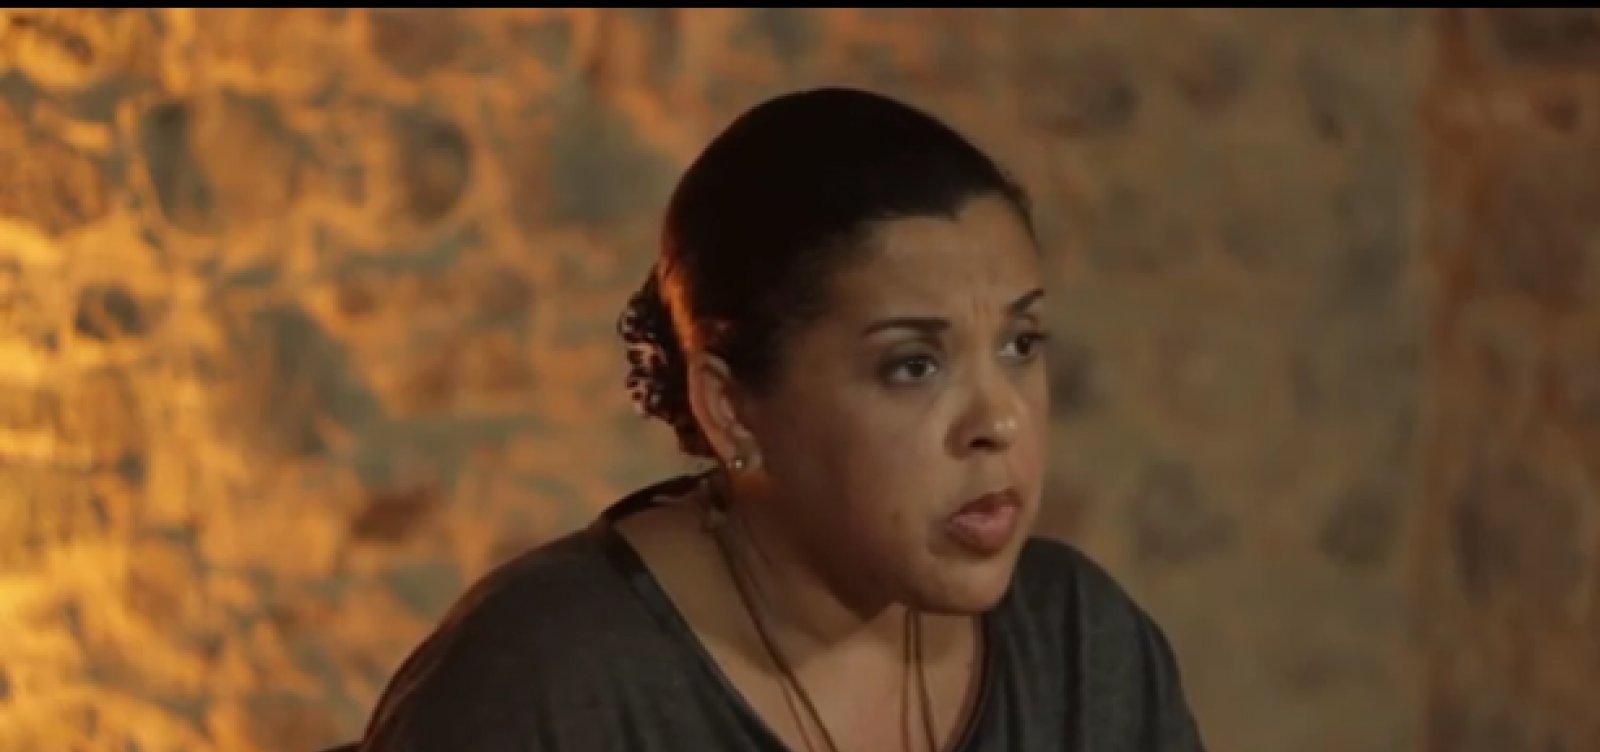 [Filha de Gilberto Gil é nomeada como coordenadora do MAM]